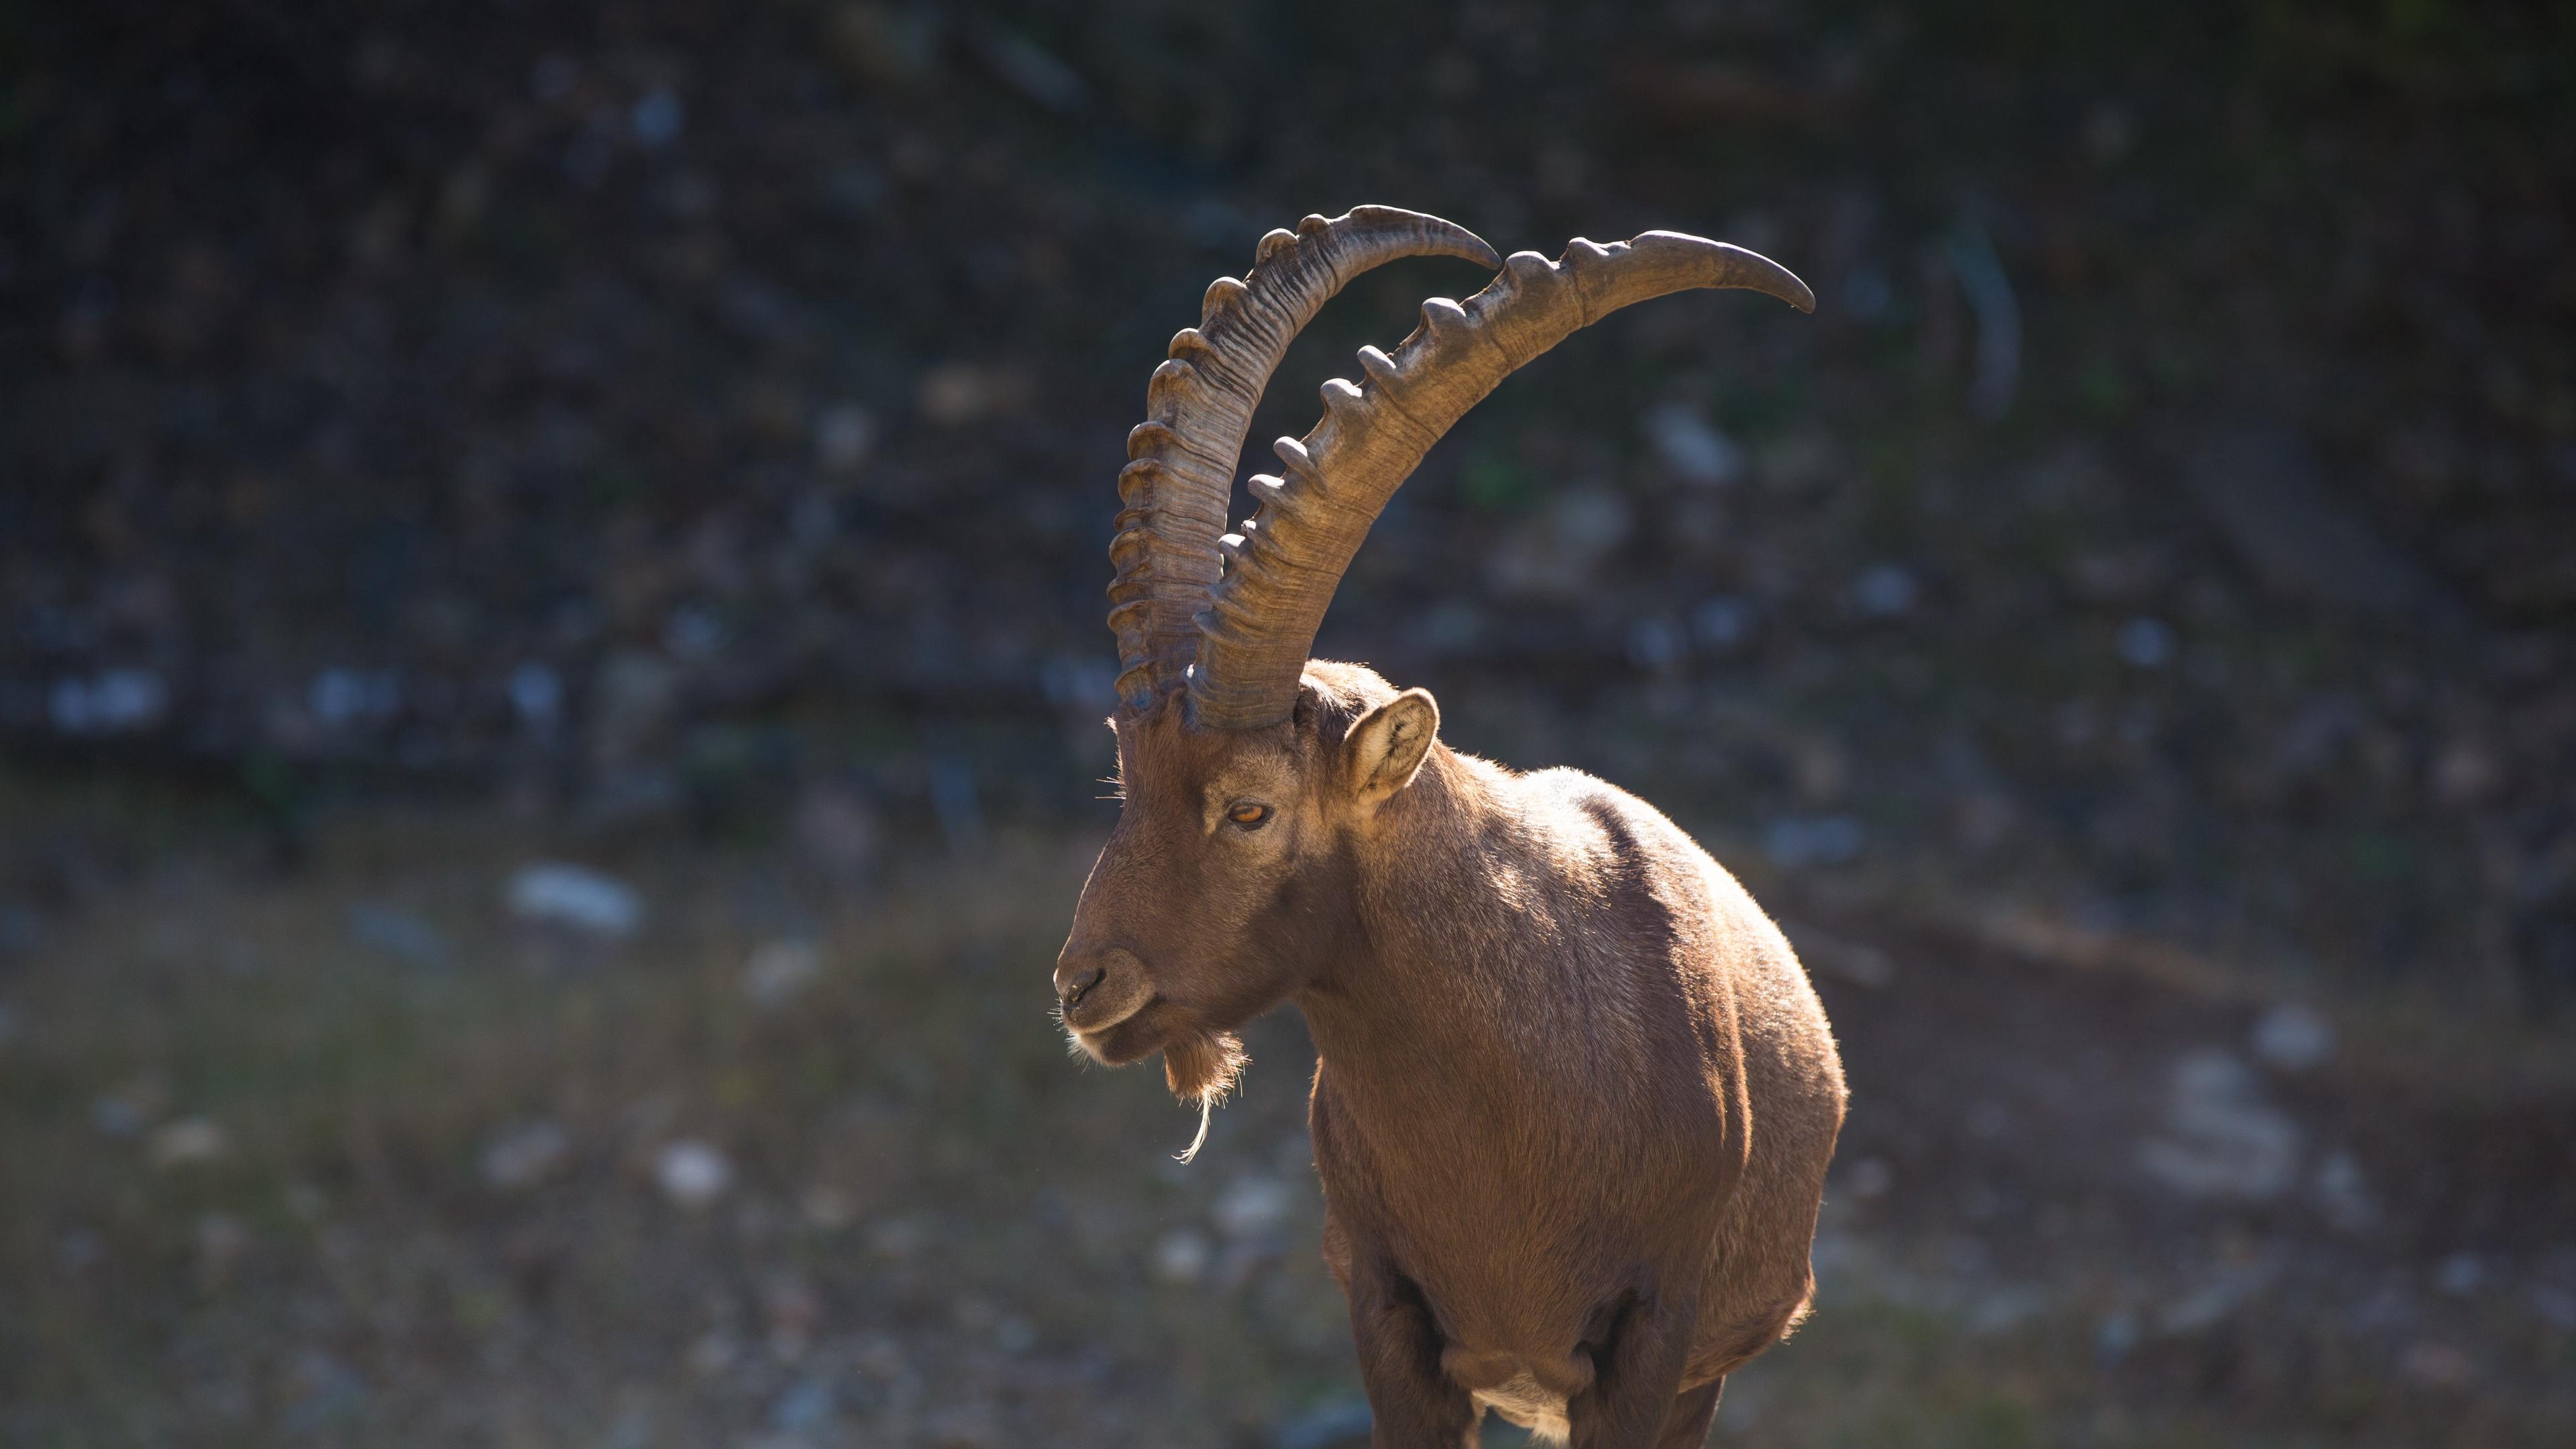 mountain goat horn alps 4k 1542242664 - mountain goat, horn, alps 4k - mountain goat, horn, Alps